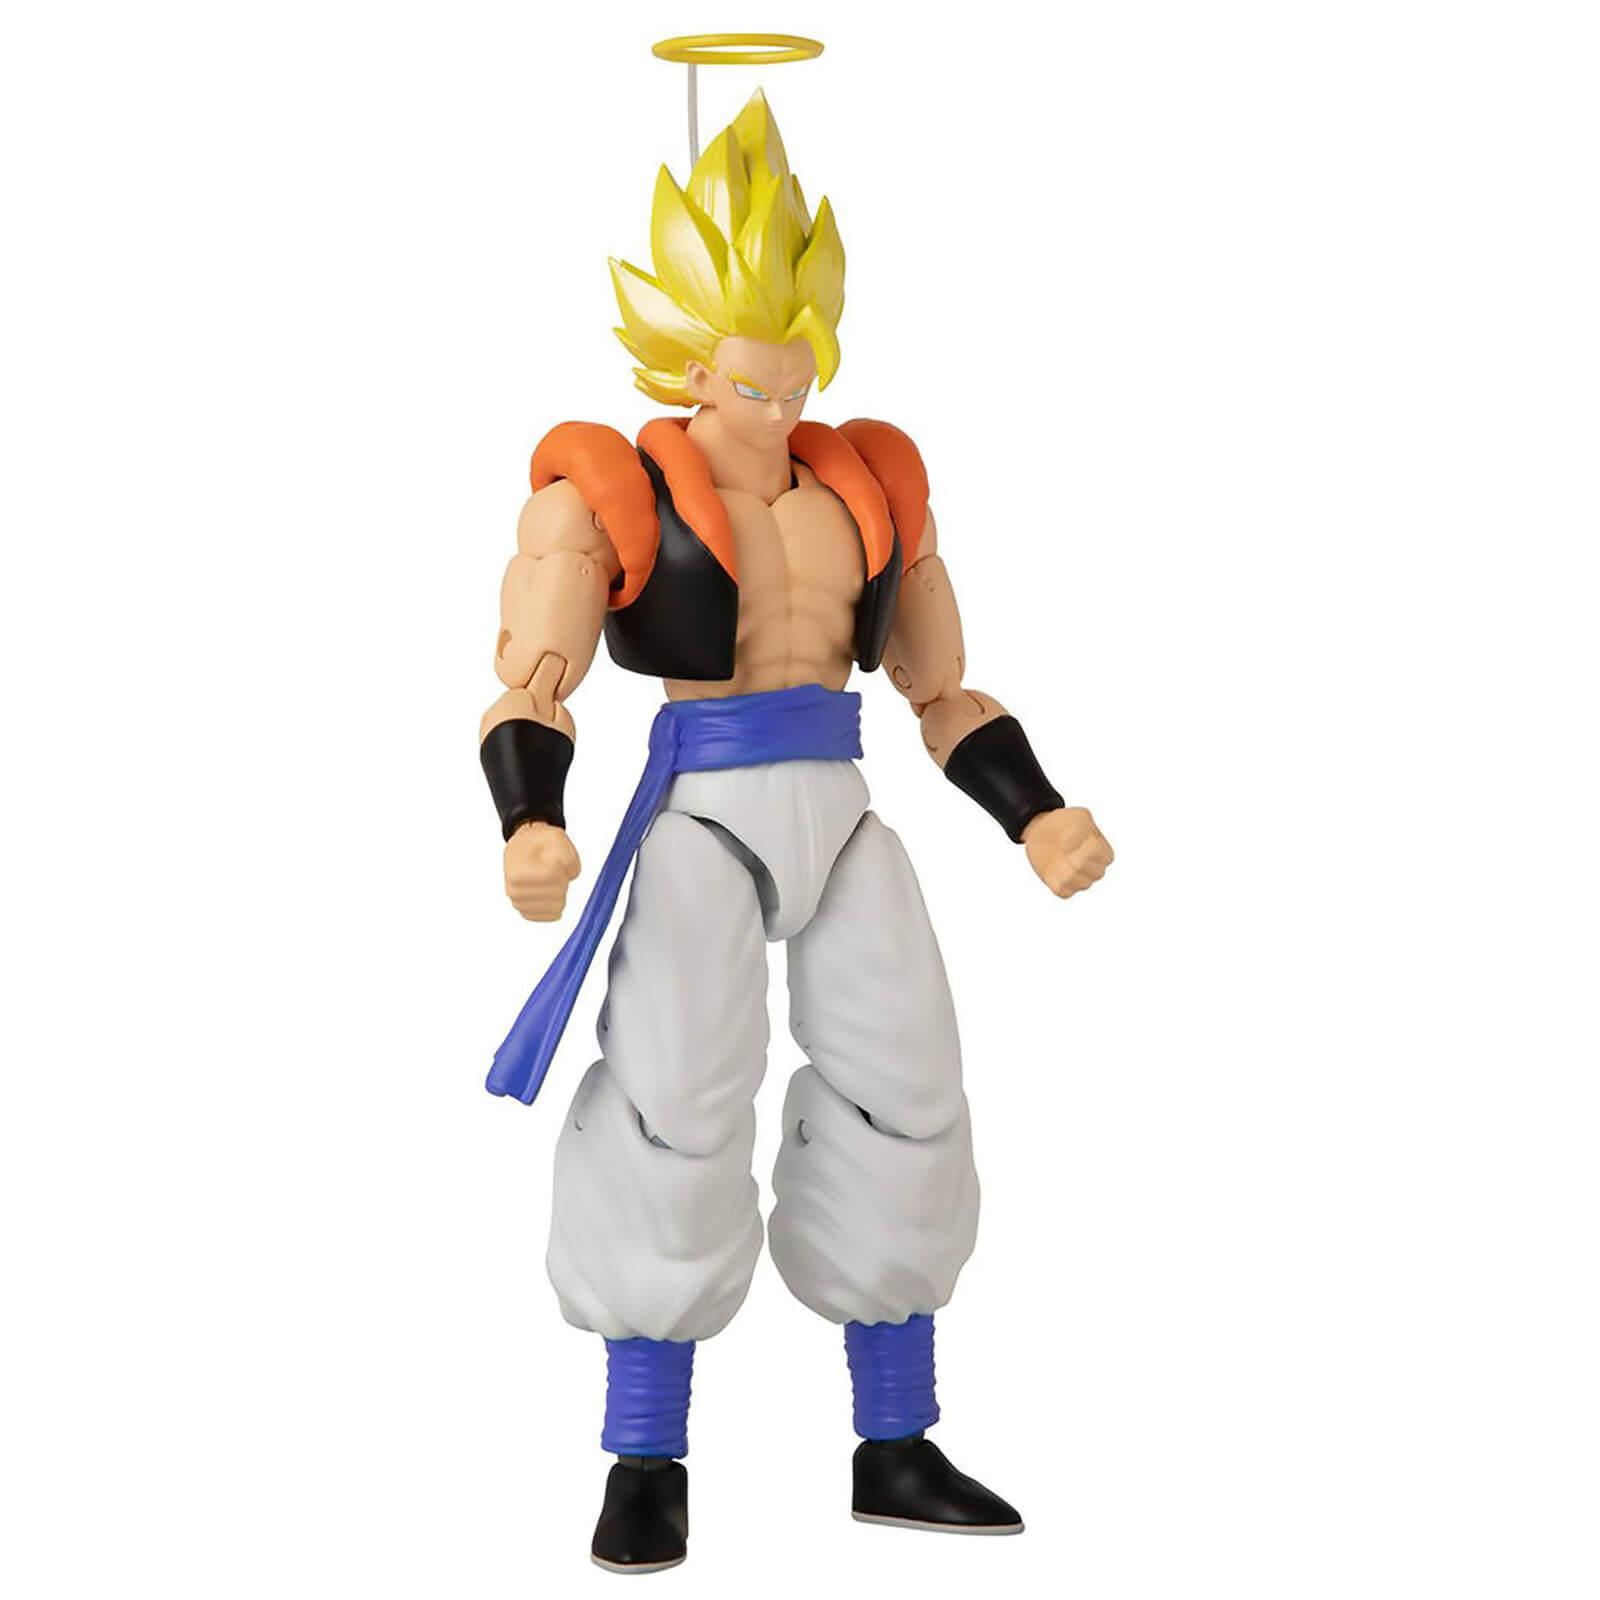 Image of Bandai Dragon Stars DBZ Super Saiyan Gogeta Action Figure